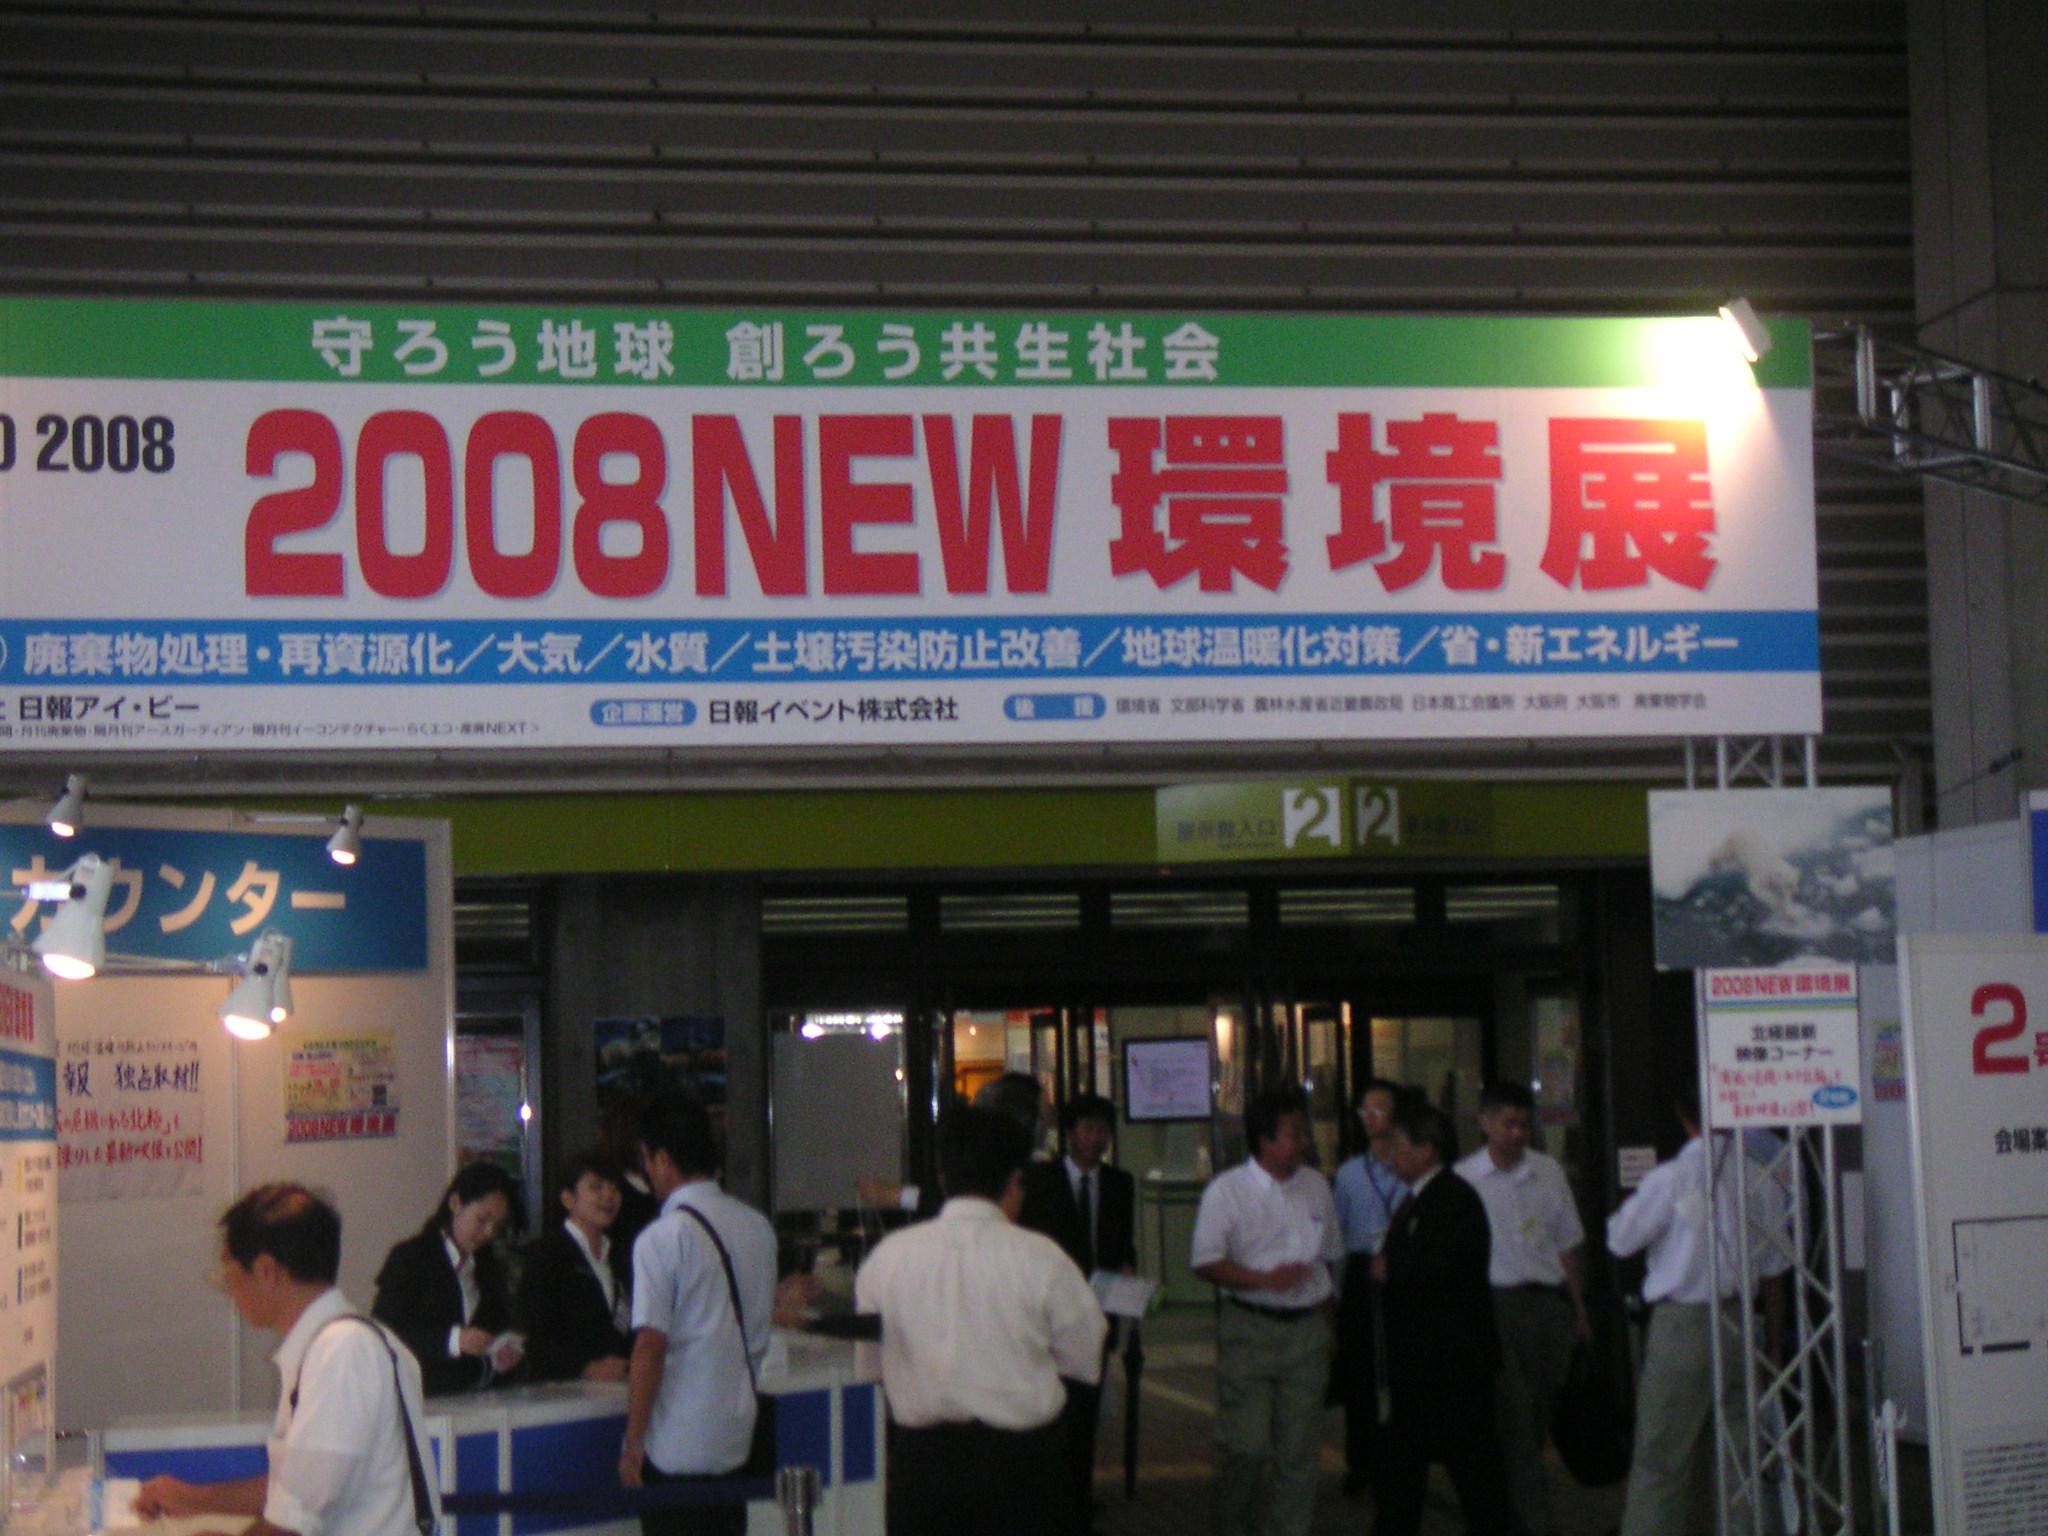 080918new-kankyo fair.JPG